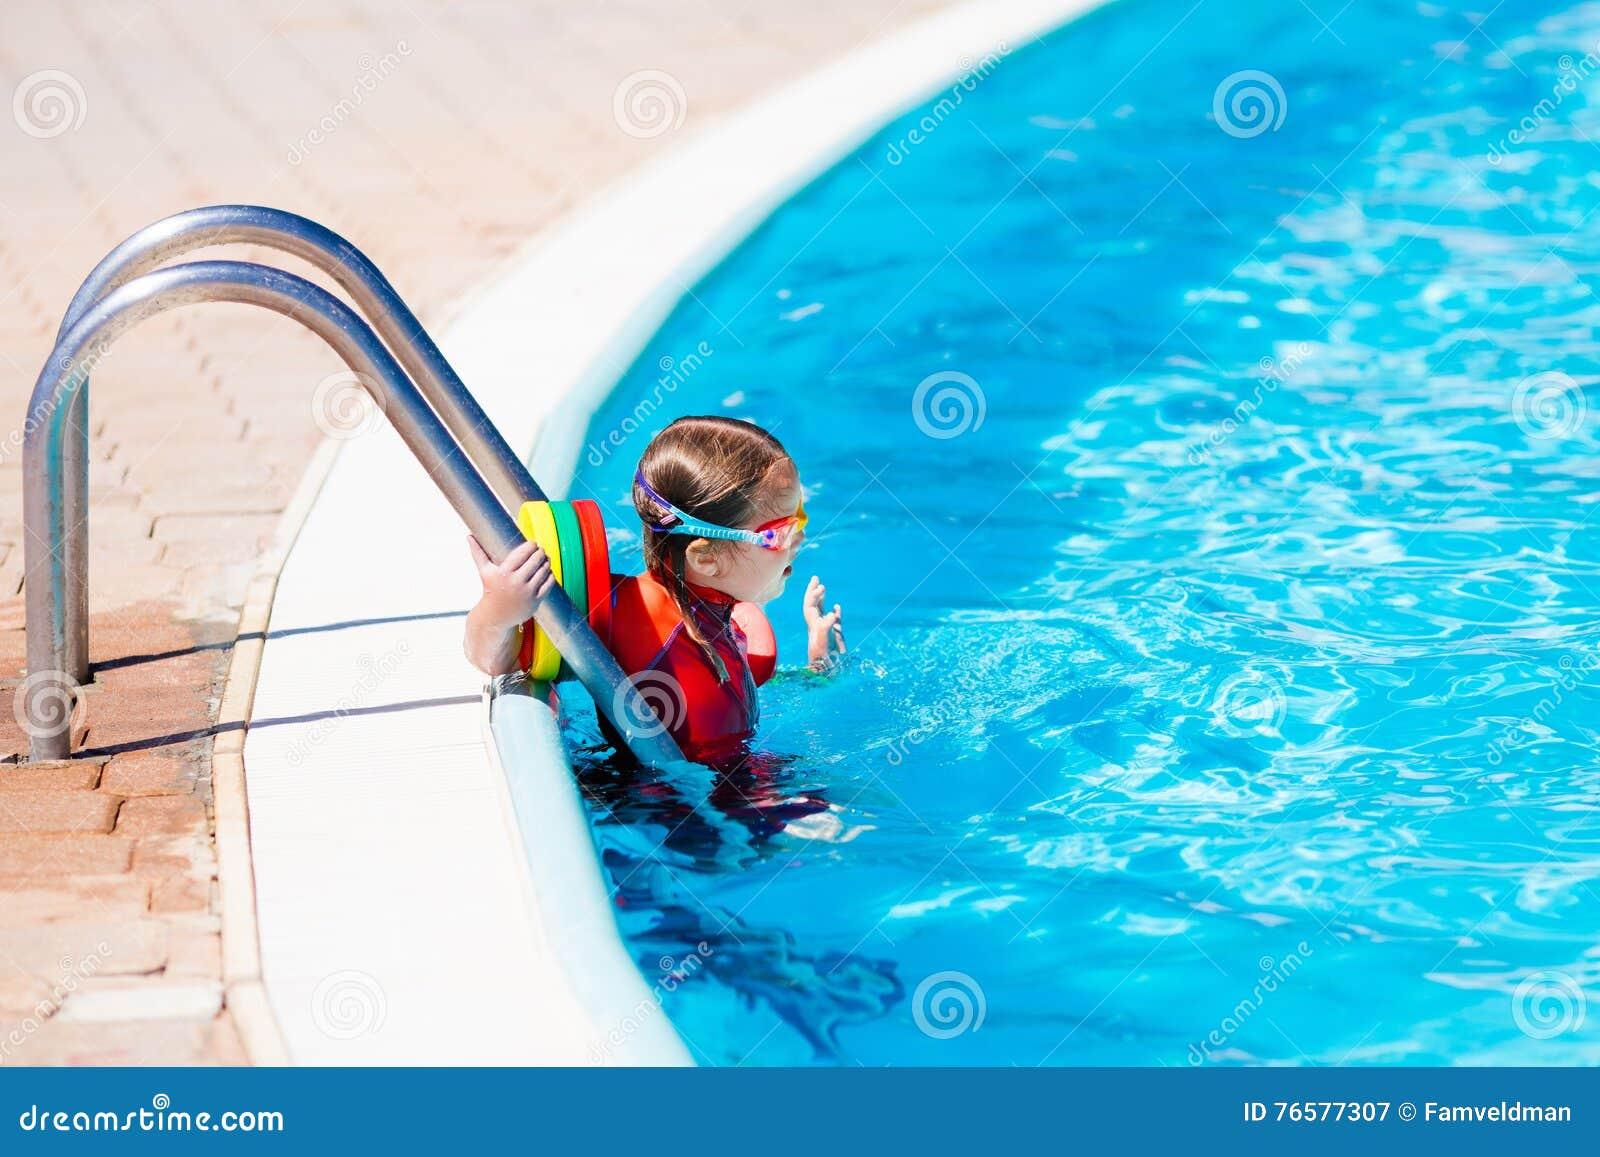 Little Girl In Swimming Pool Stock Image - Image of aqua